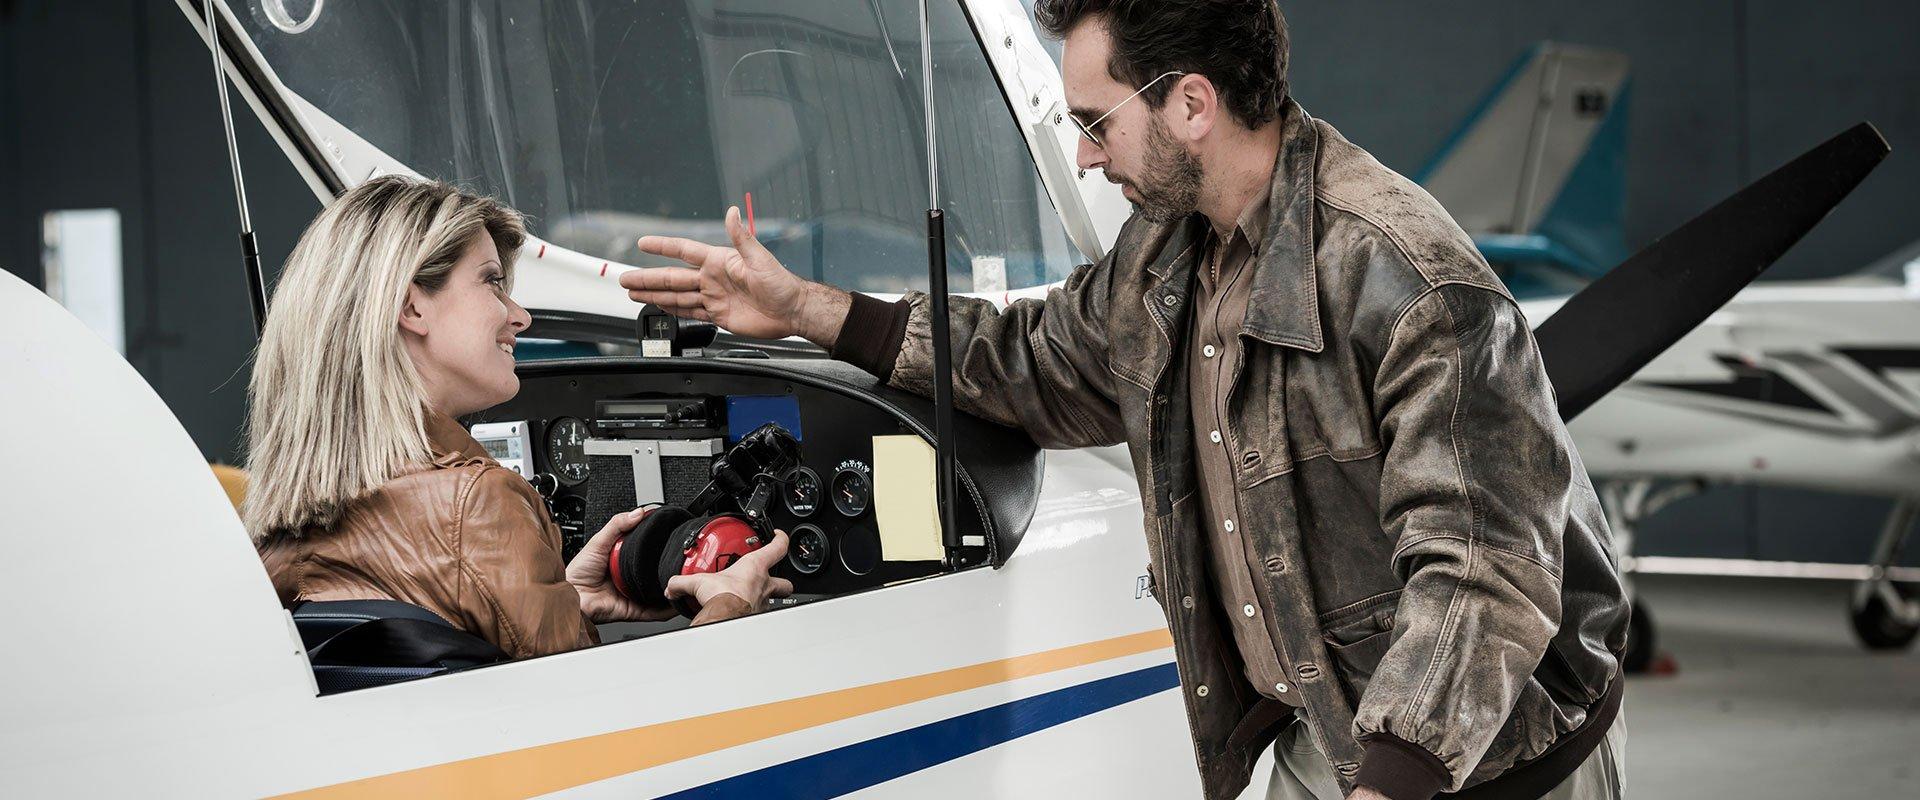 Pilot Training & Flying Lessons